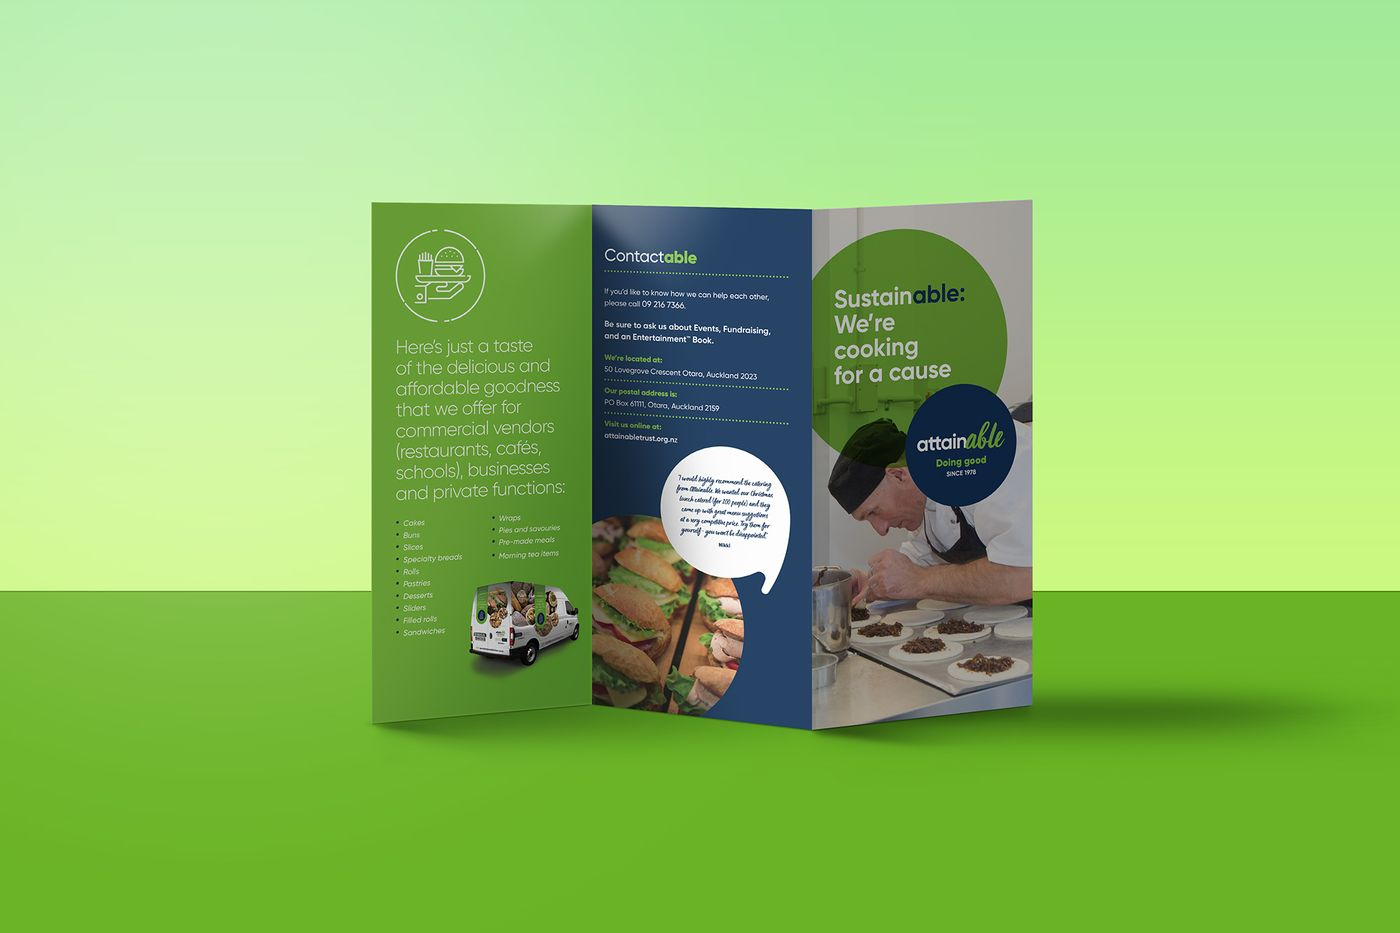 The Good Purpose Kitchen brochure